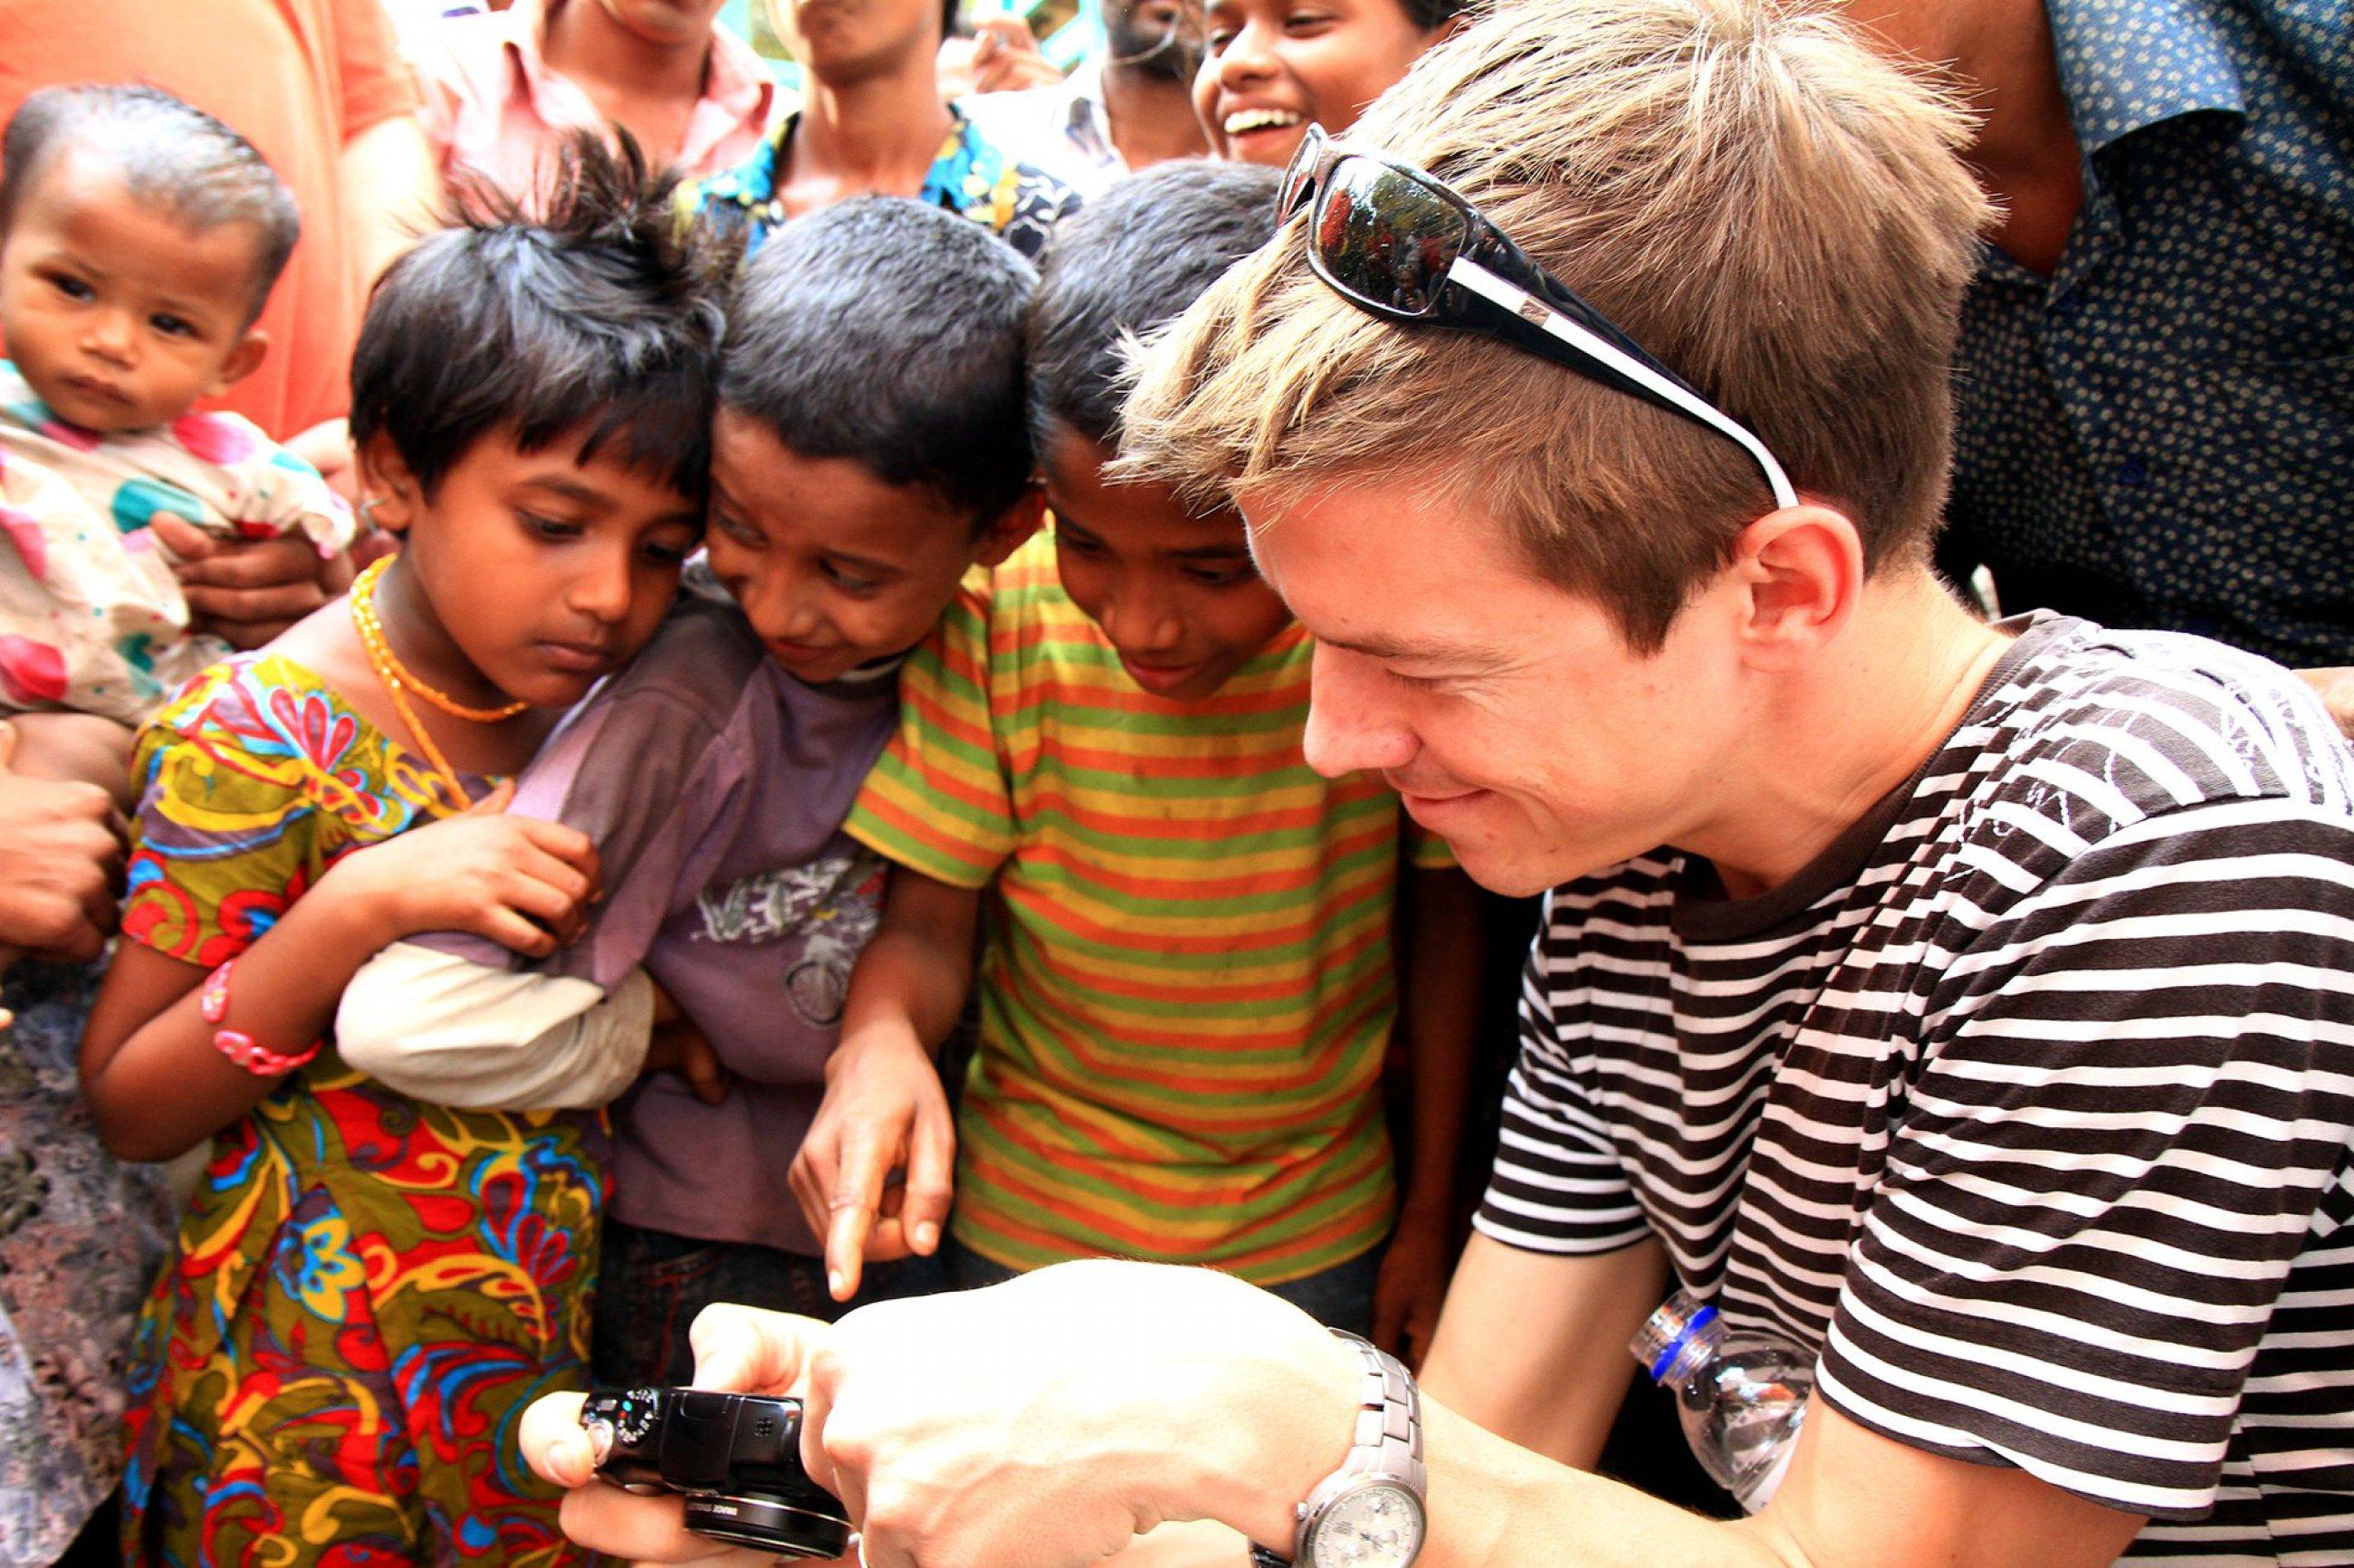 https://bubo.sk/uploads/galleries/7333/jozef-zeliznak-banglades-20-.jpg